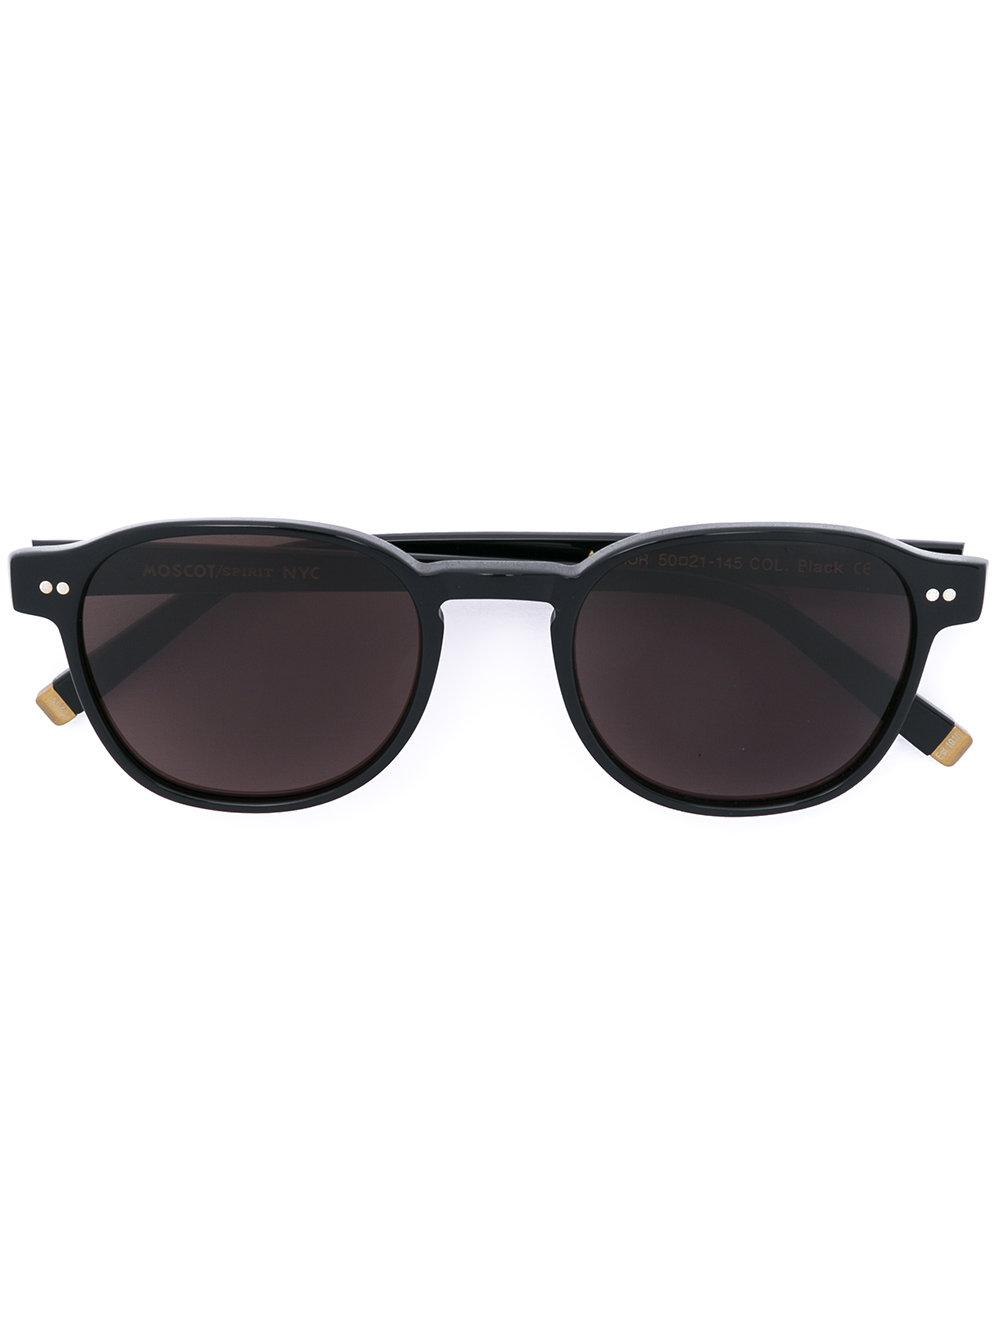 Moscot Arthur Glasses In Black